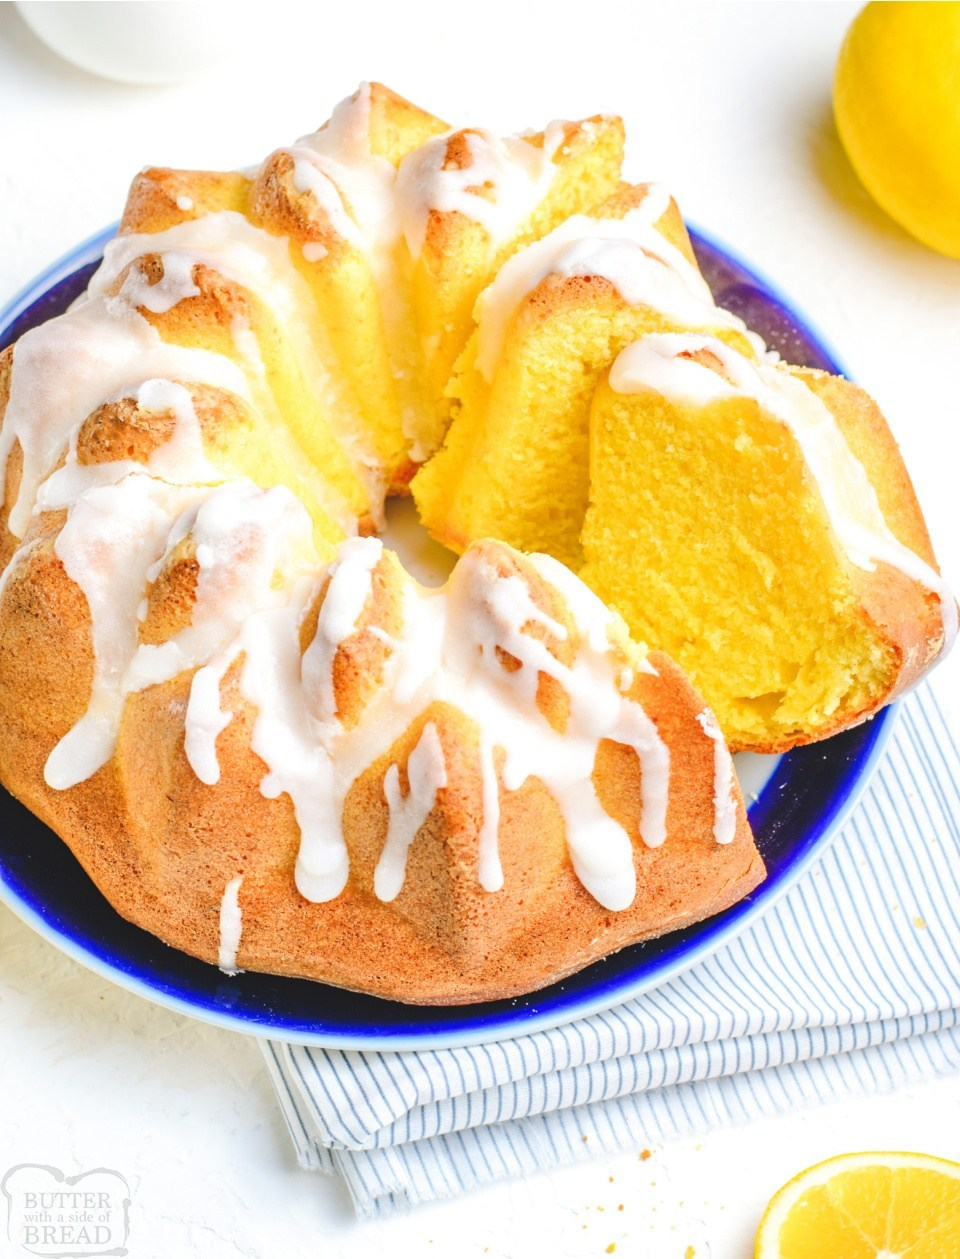 Iced Lemon Bundt Cake recipe